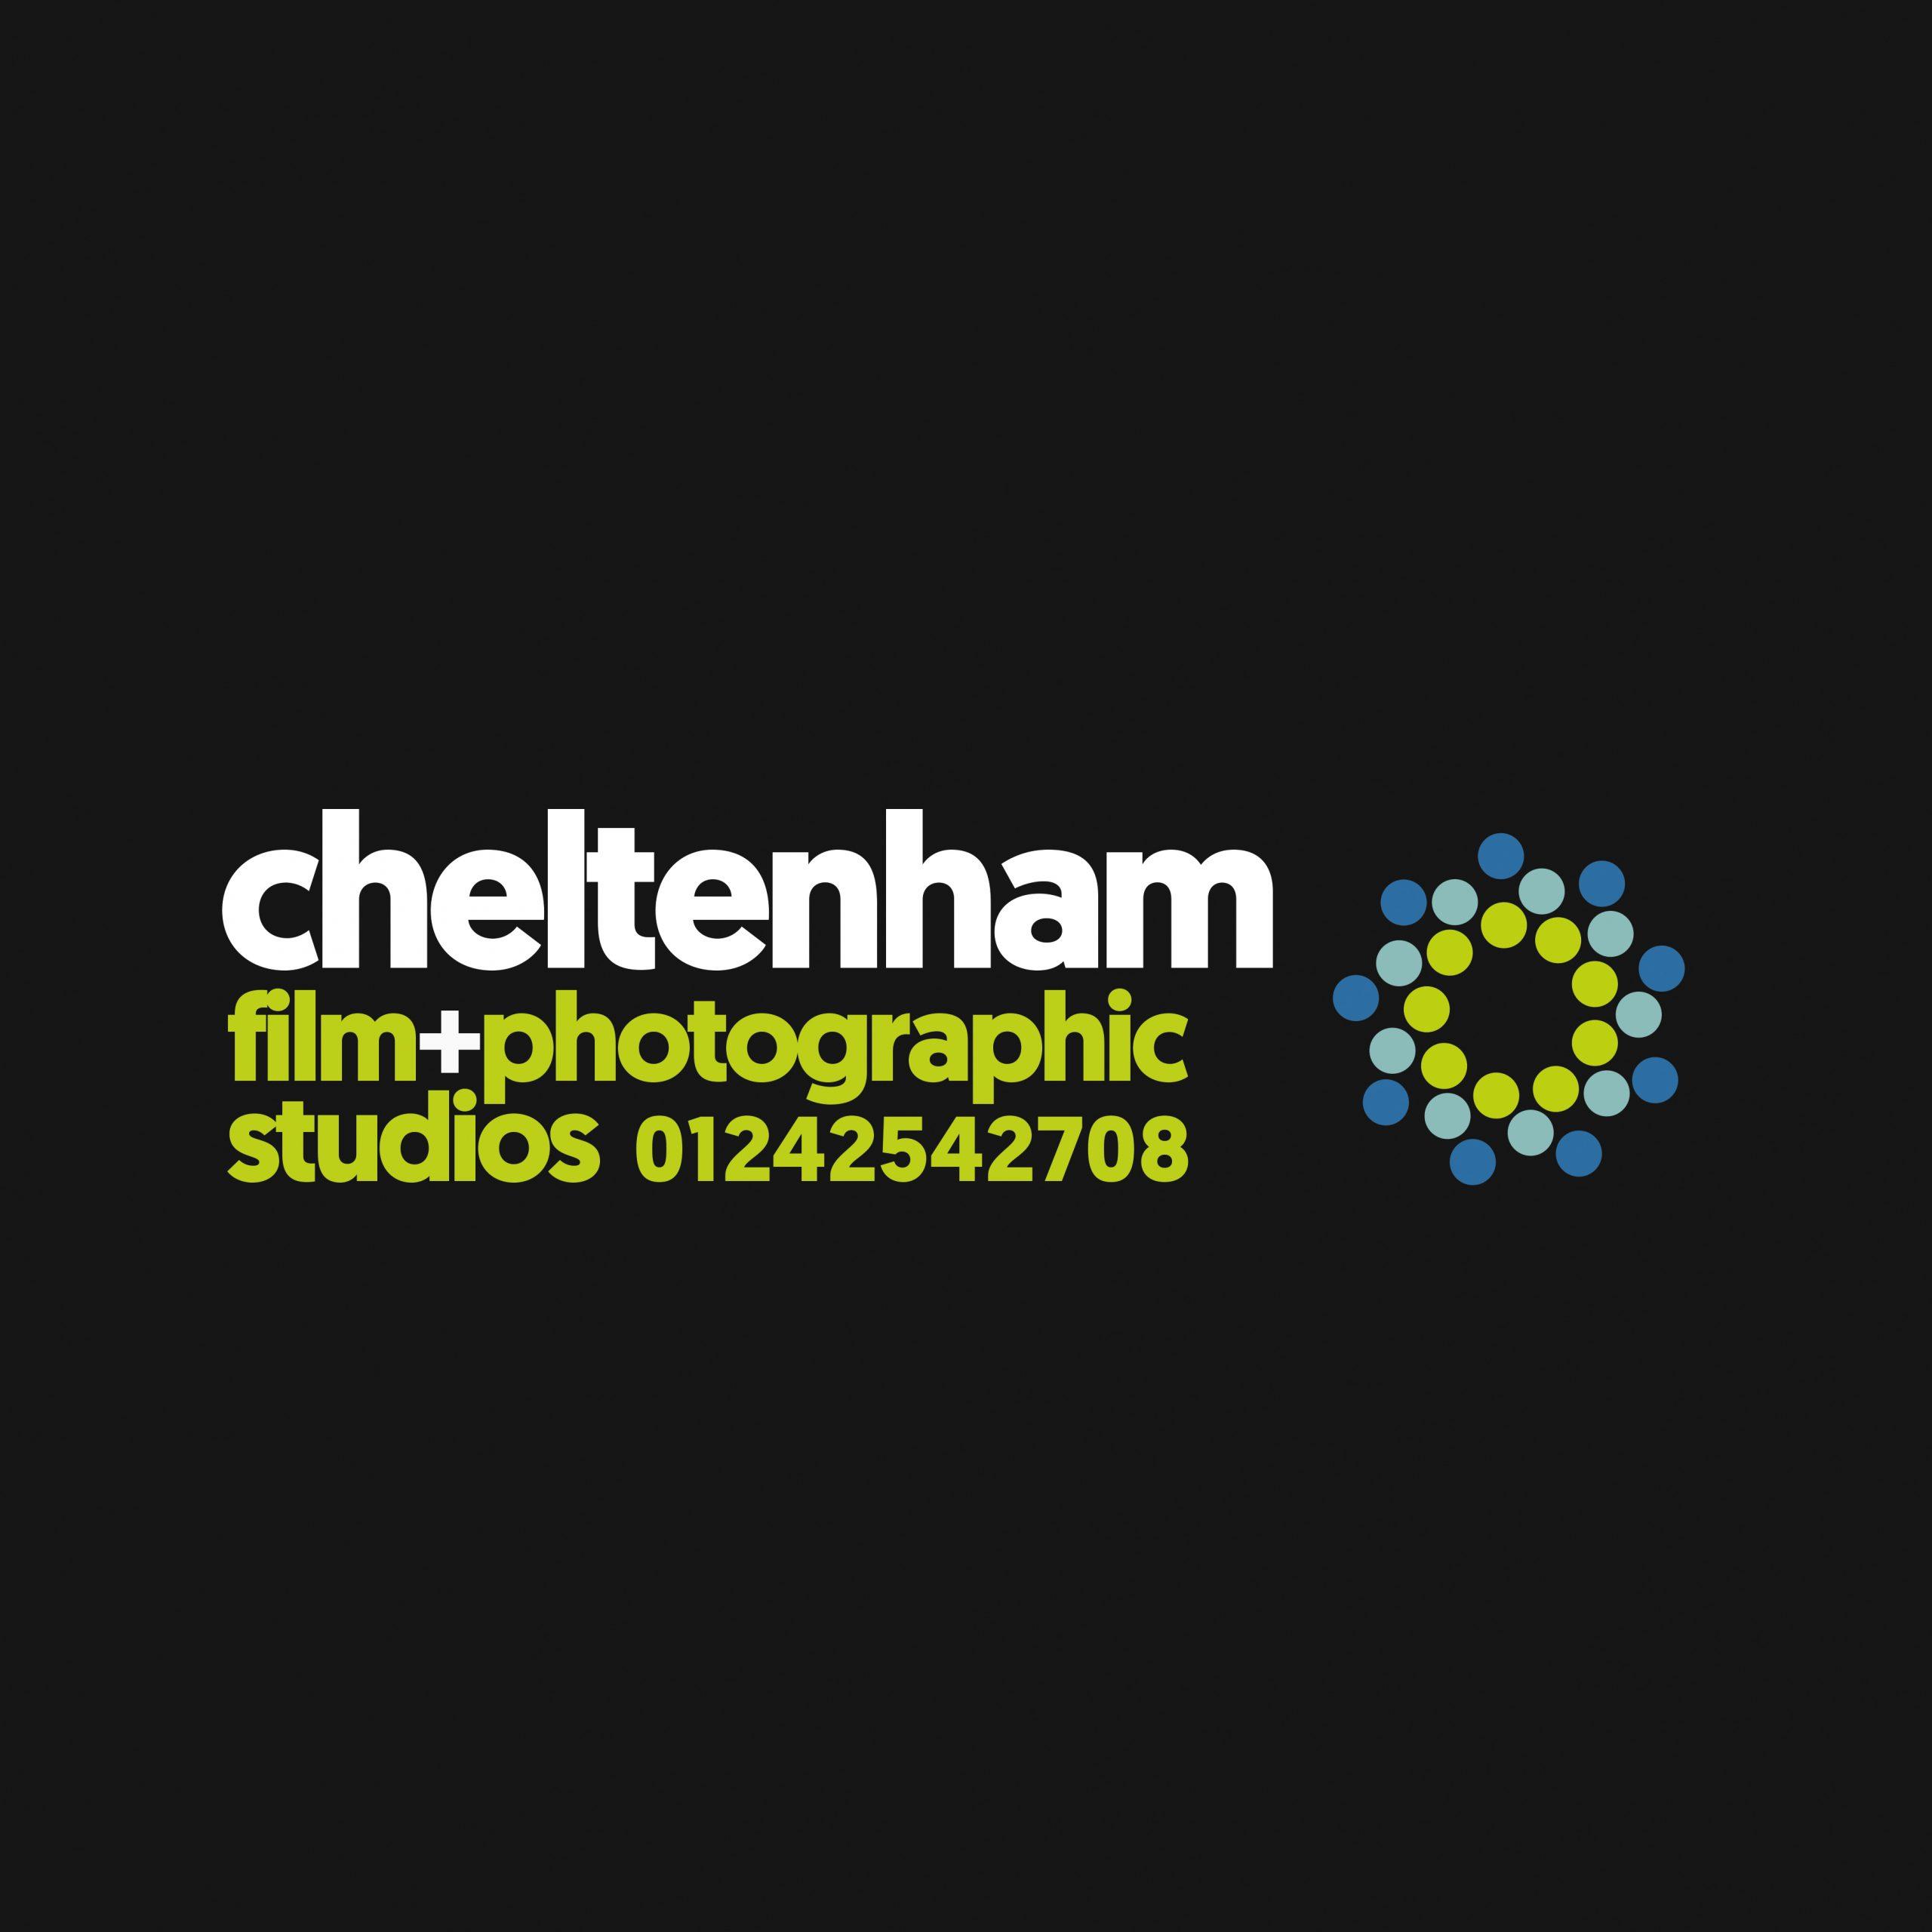 Cheltenham Film and Photographic Studios